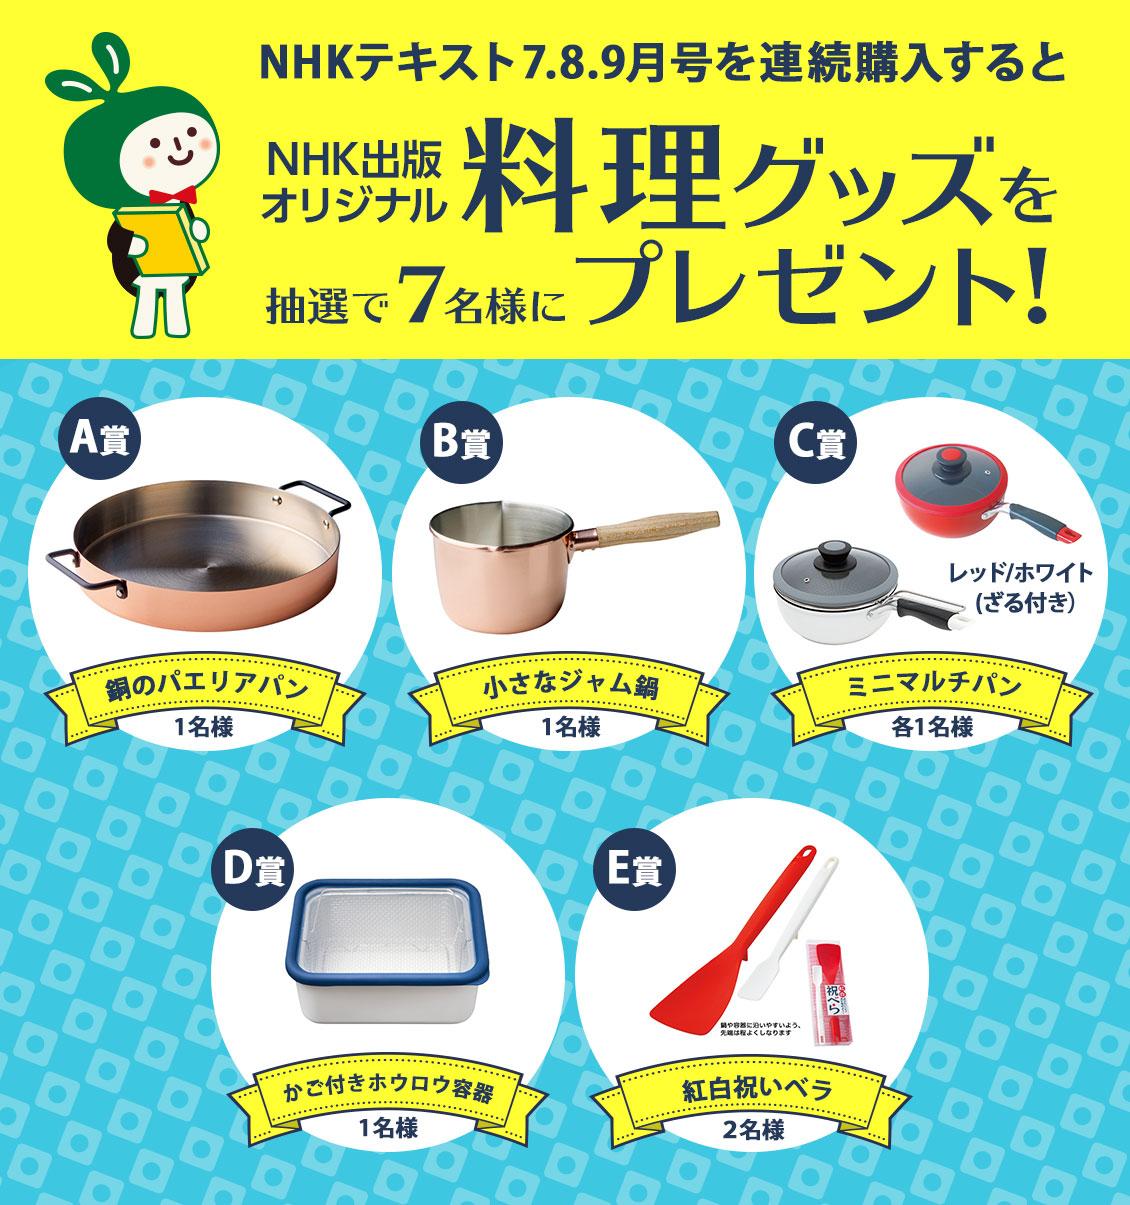 NHKテキスト7・8・9月号ご購入で抽選プレゼント